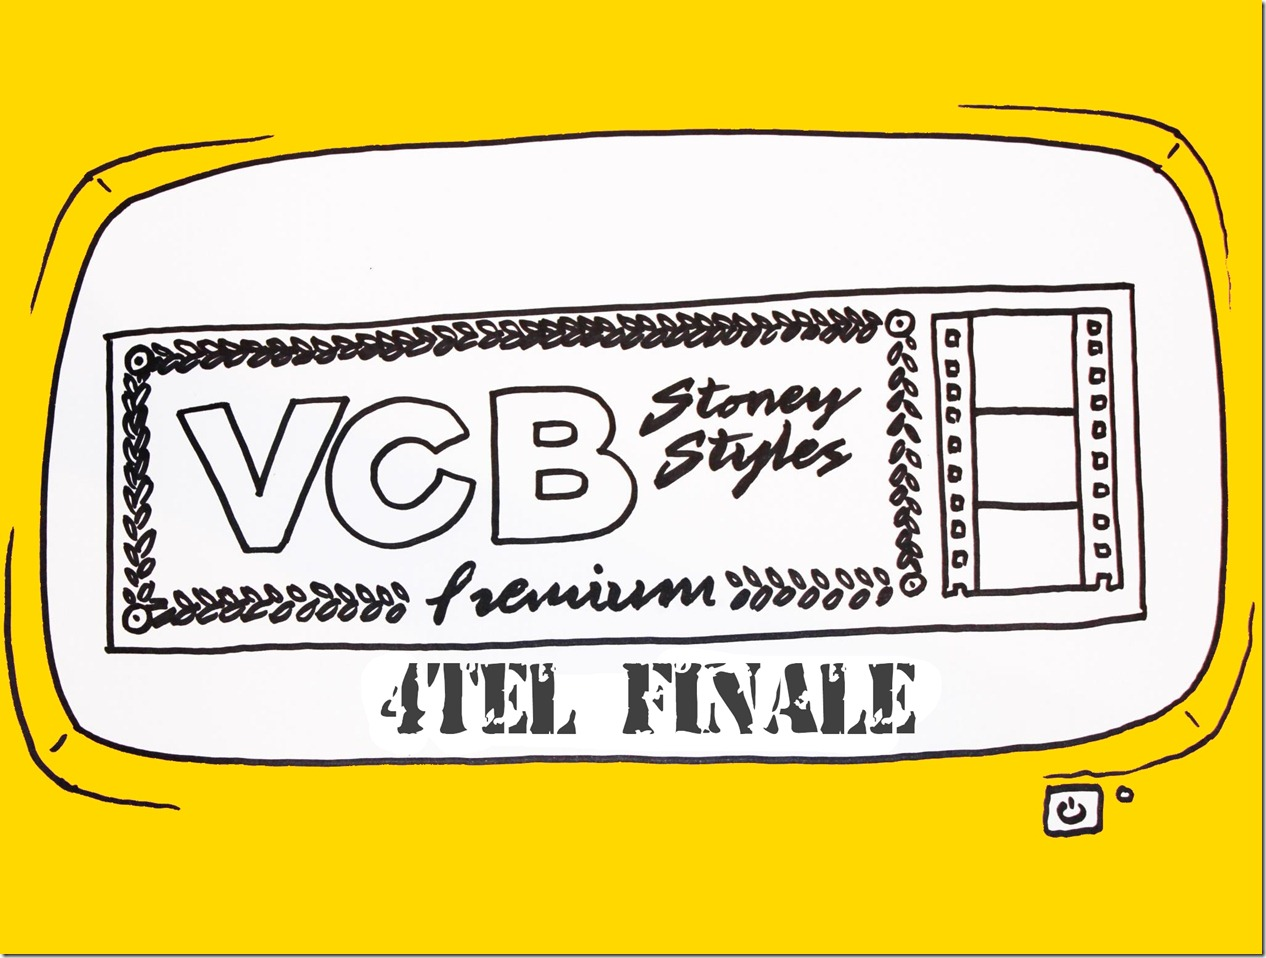 VCB-4tel-Finale-2012-Hinrunde-Rueckrunde